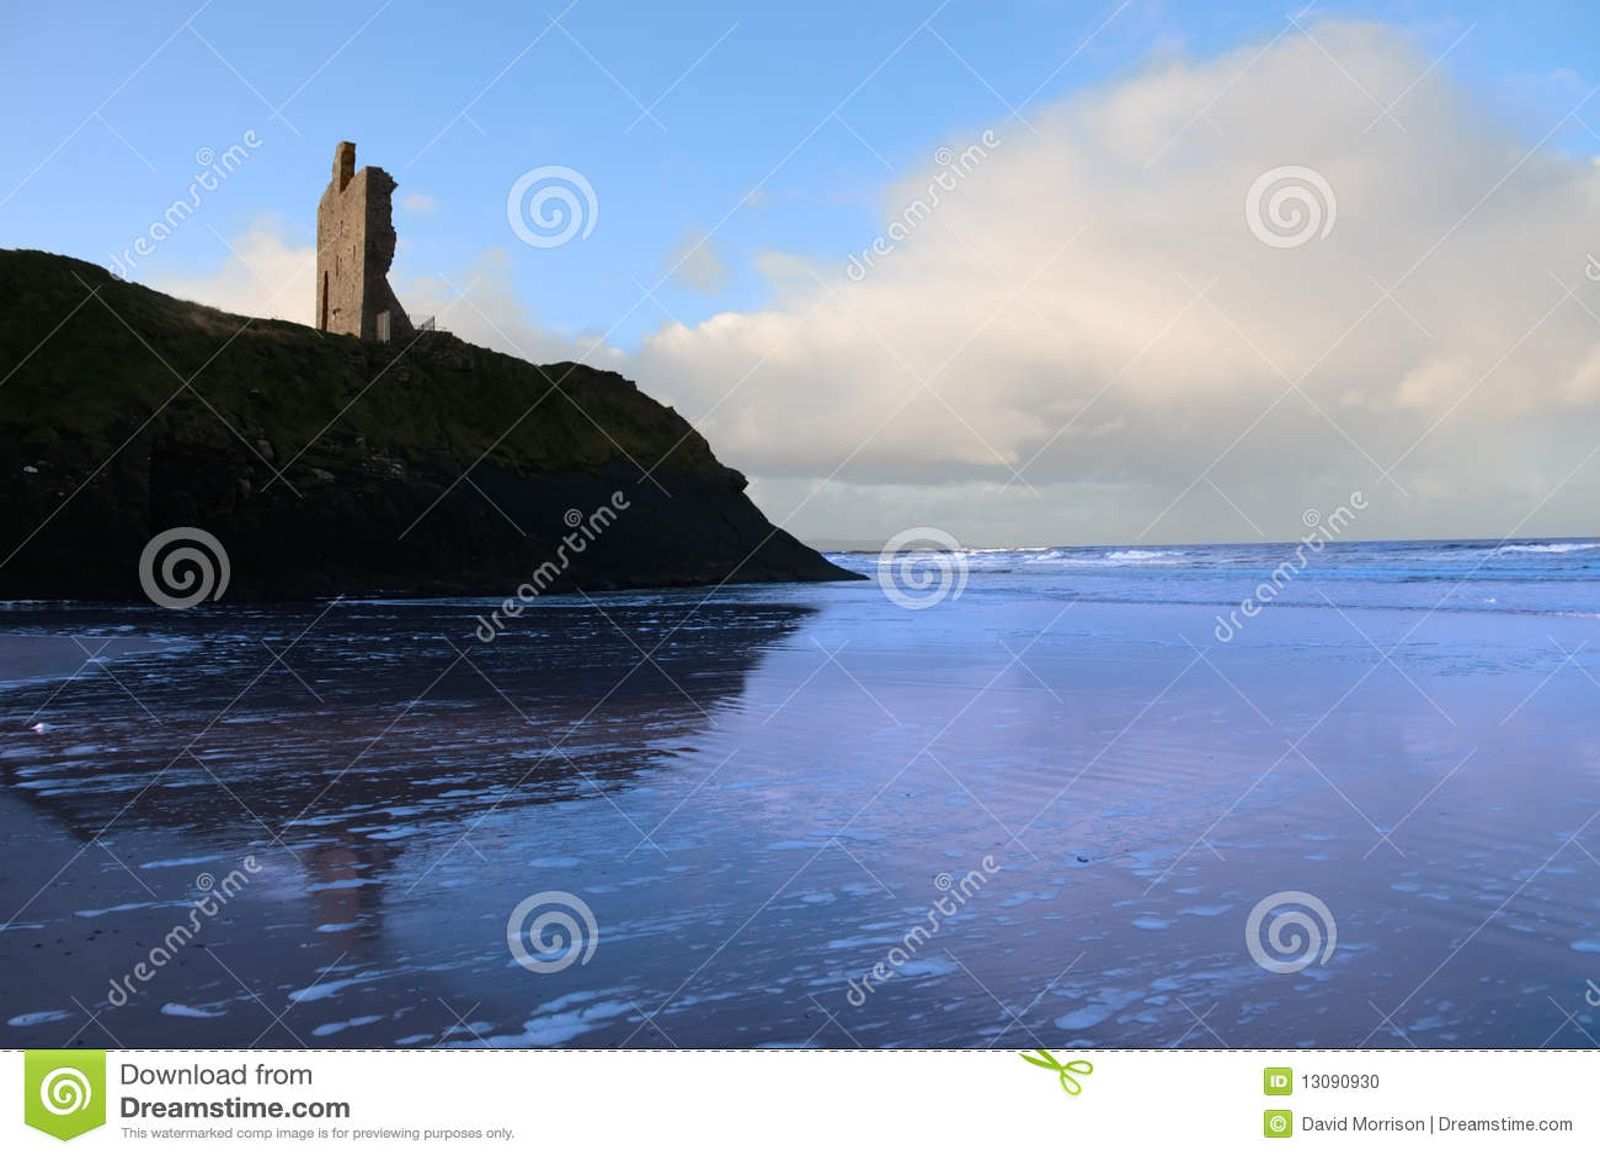 Download Blue Ballybunion Beach Castle And Sea Stock Photo - Image of ballybunion, headland: 13090930